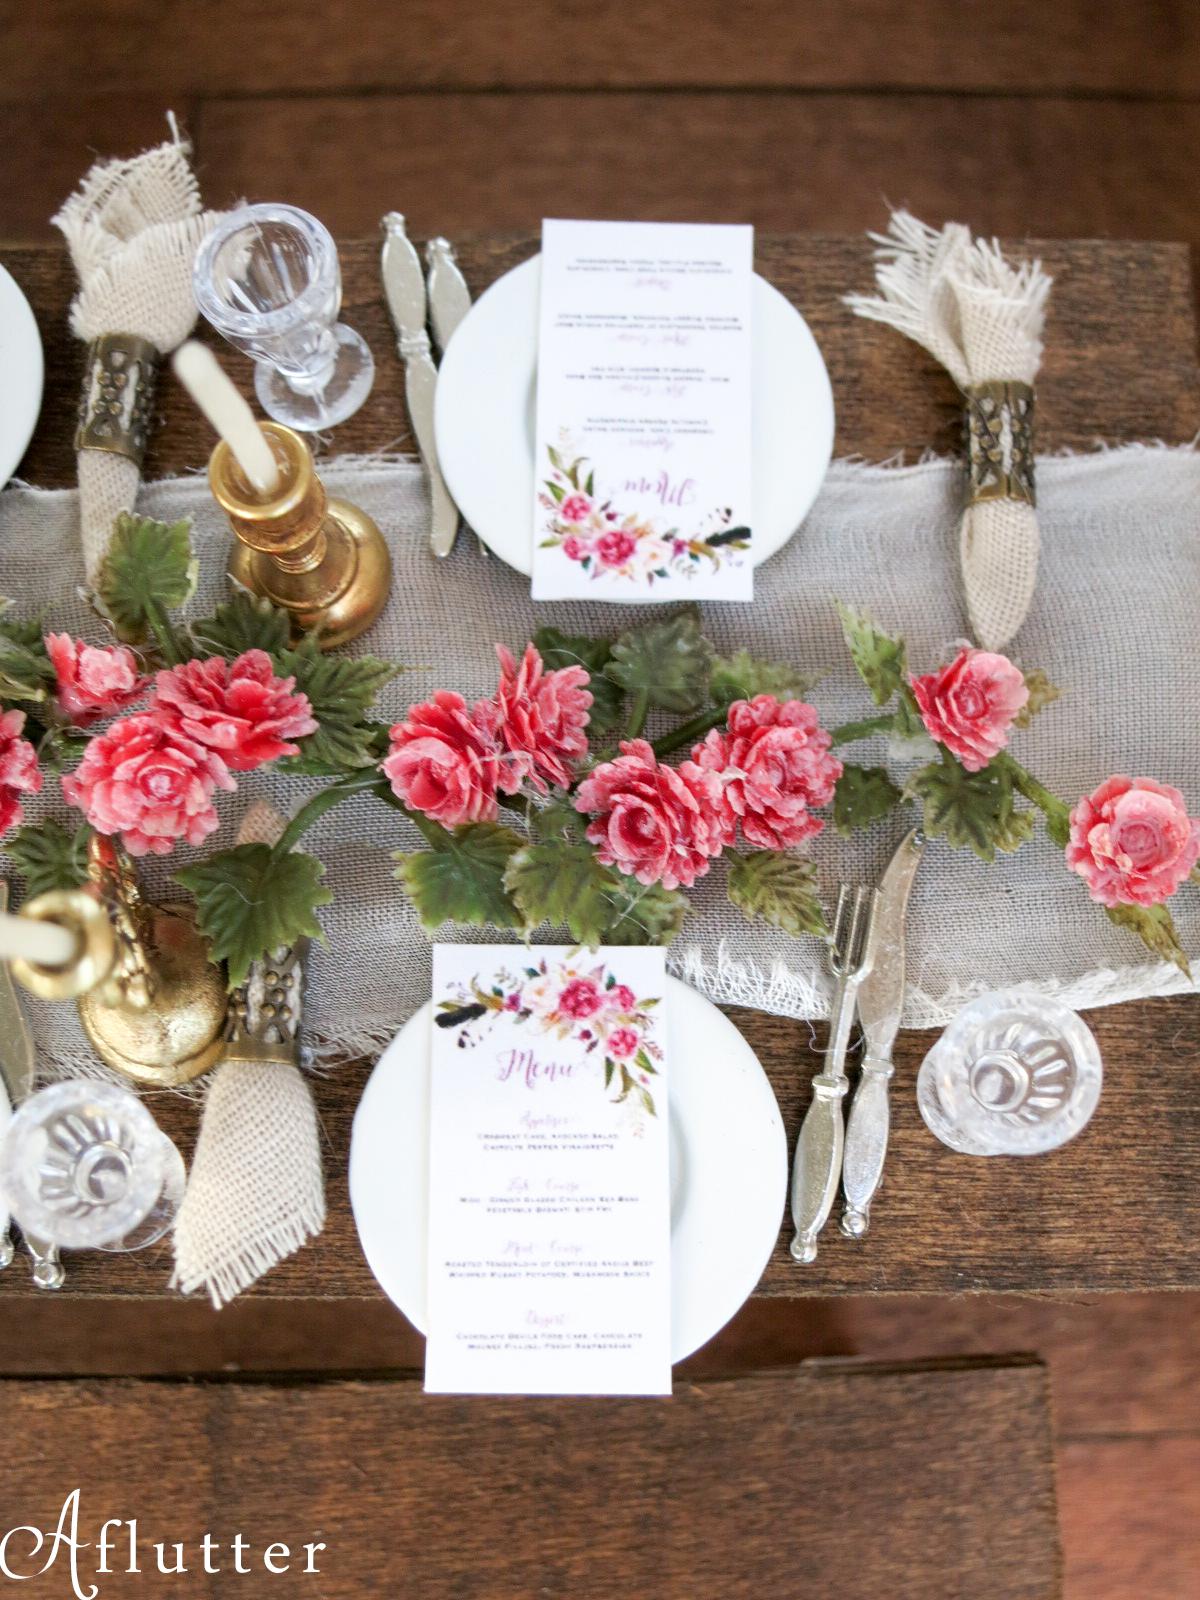 Brenul-Barn-Mini-Wedding-7-of-16.jpg